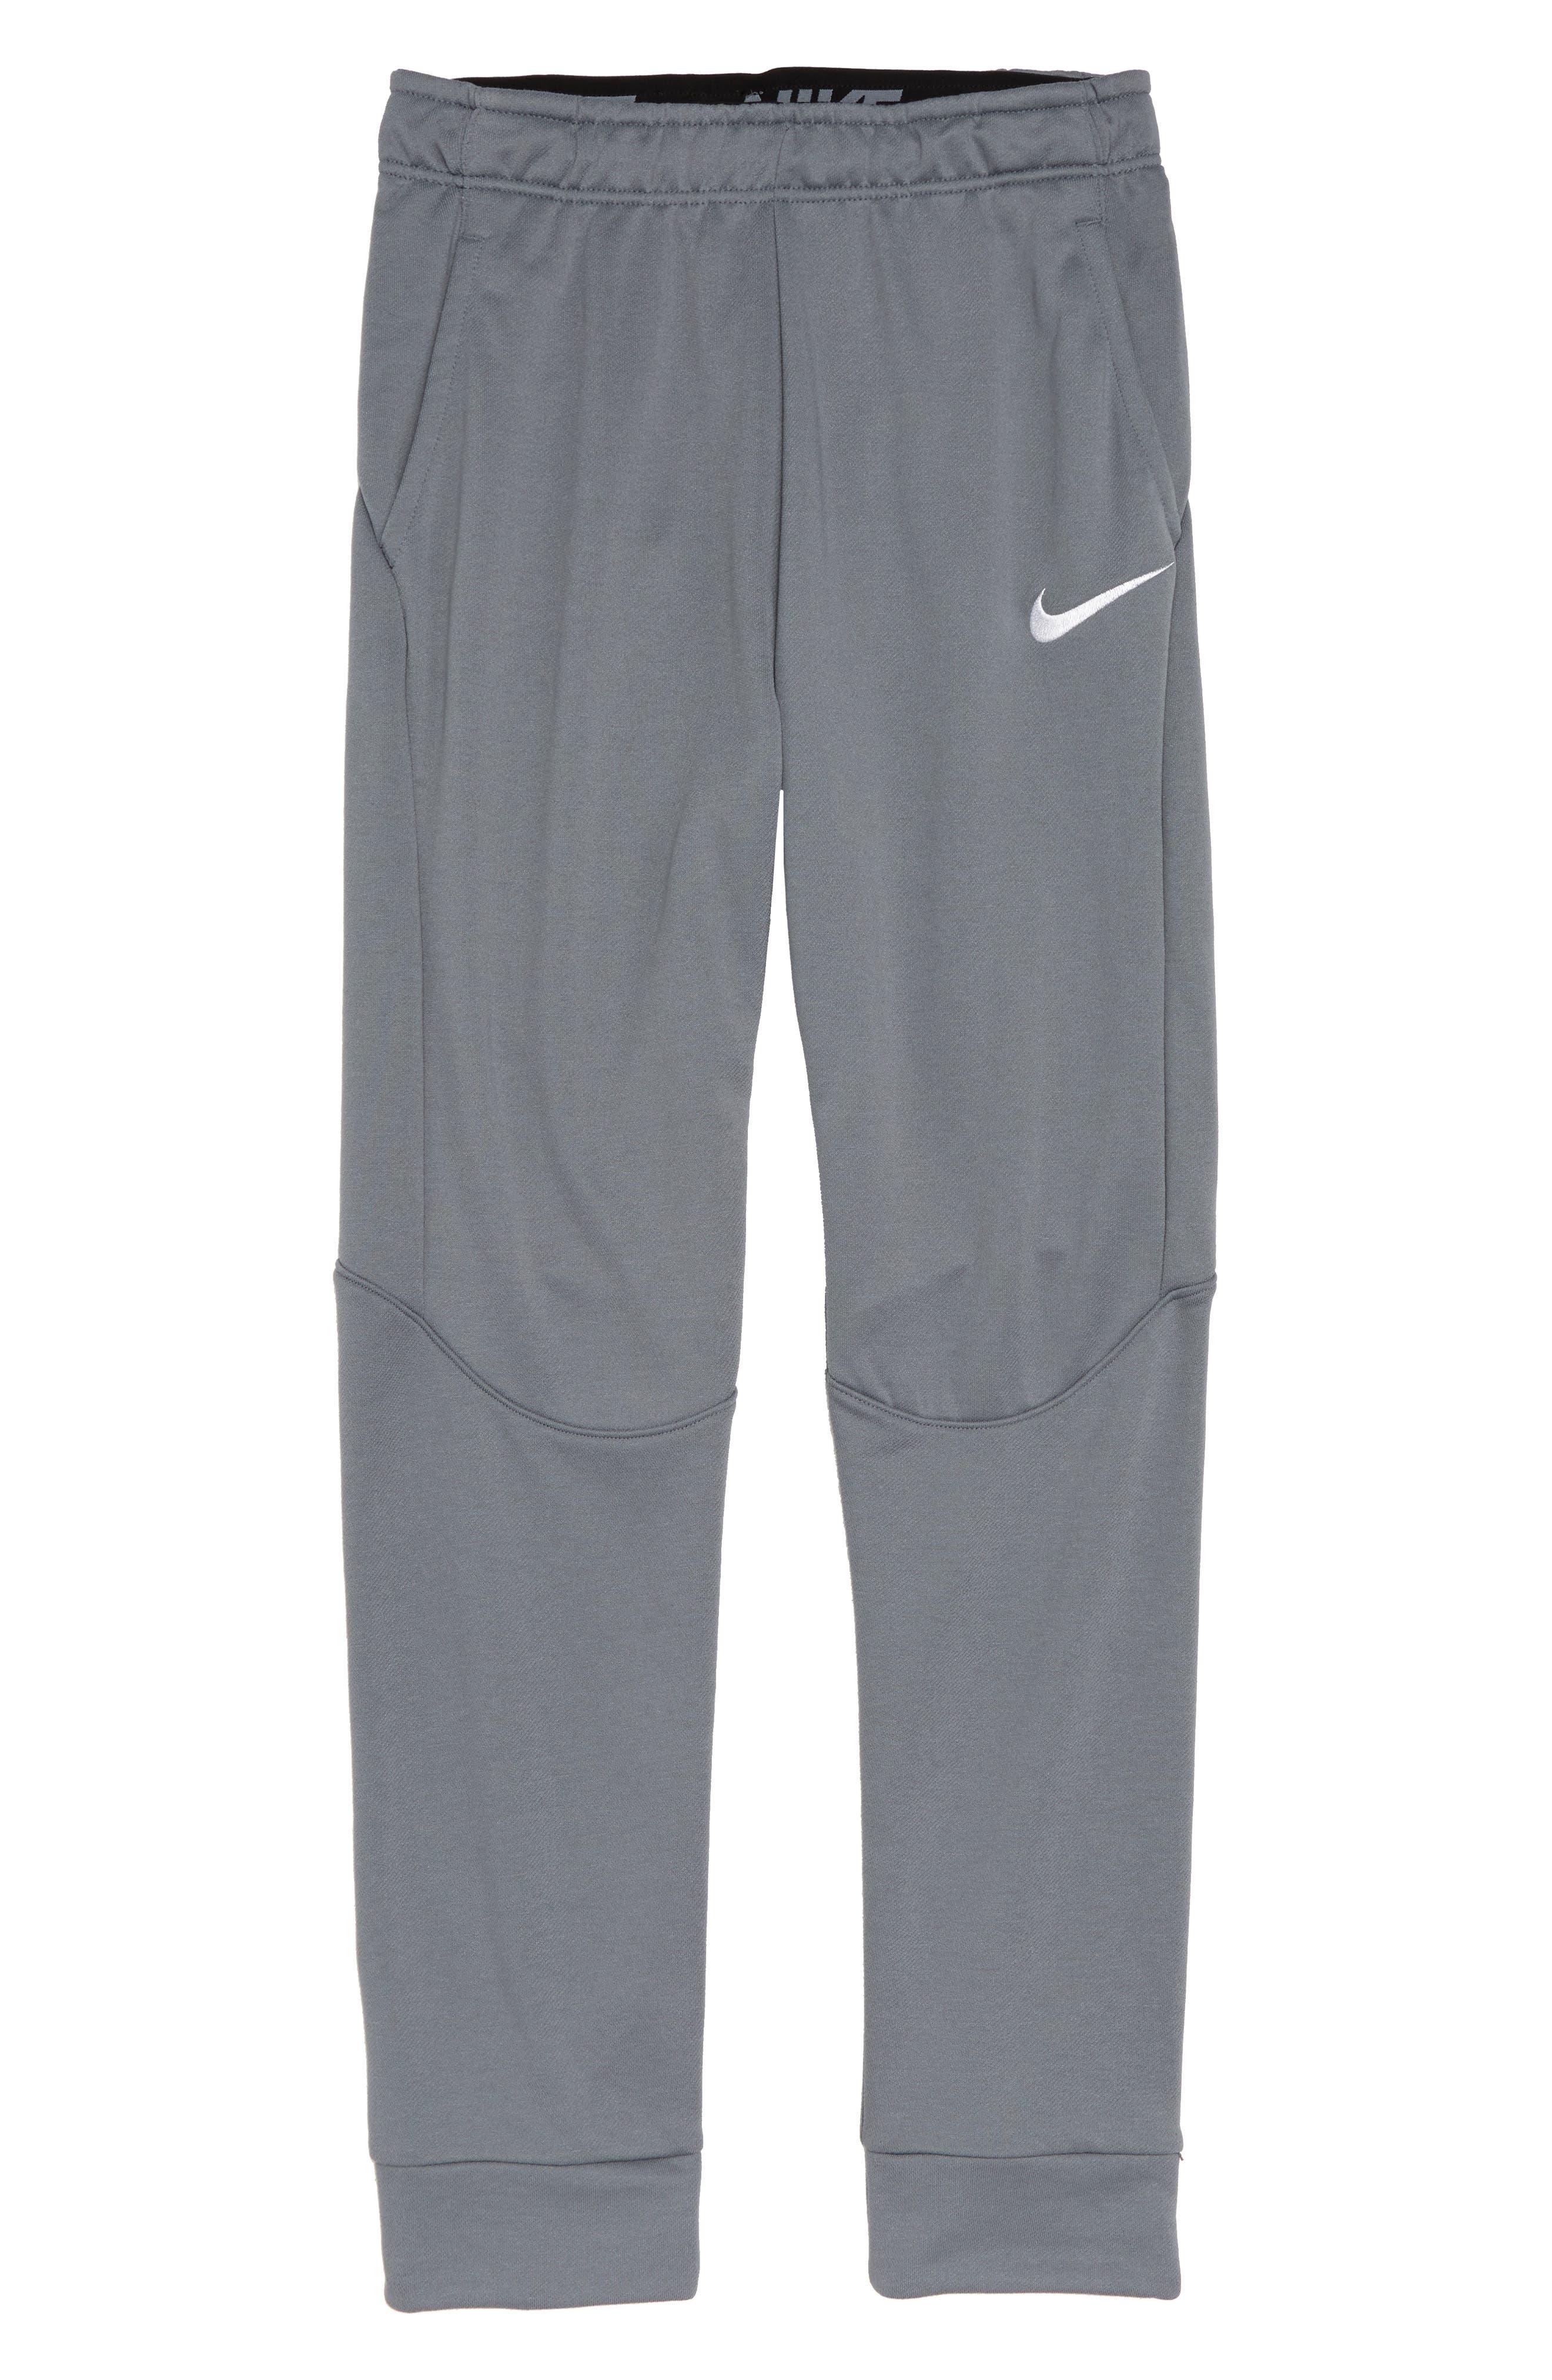 Dry Fleece Training Pants,                         Main,                         color, 065